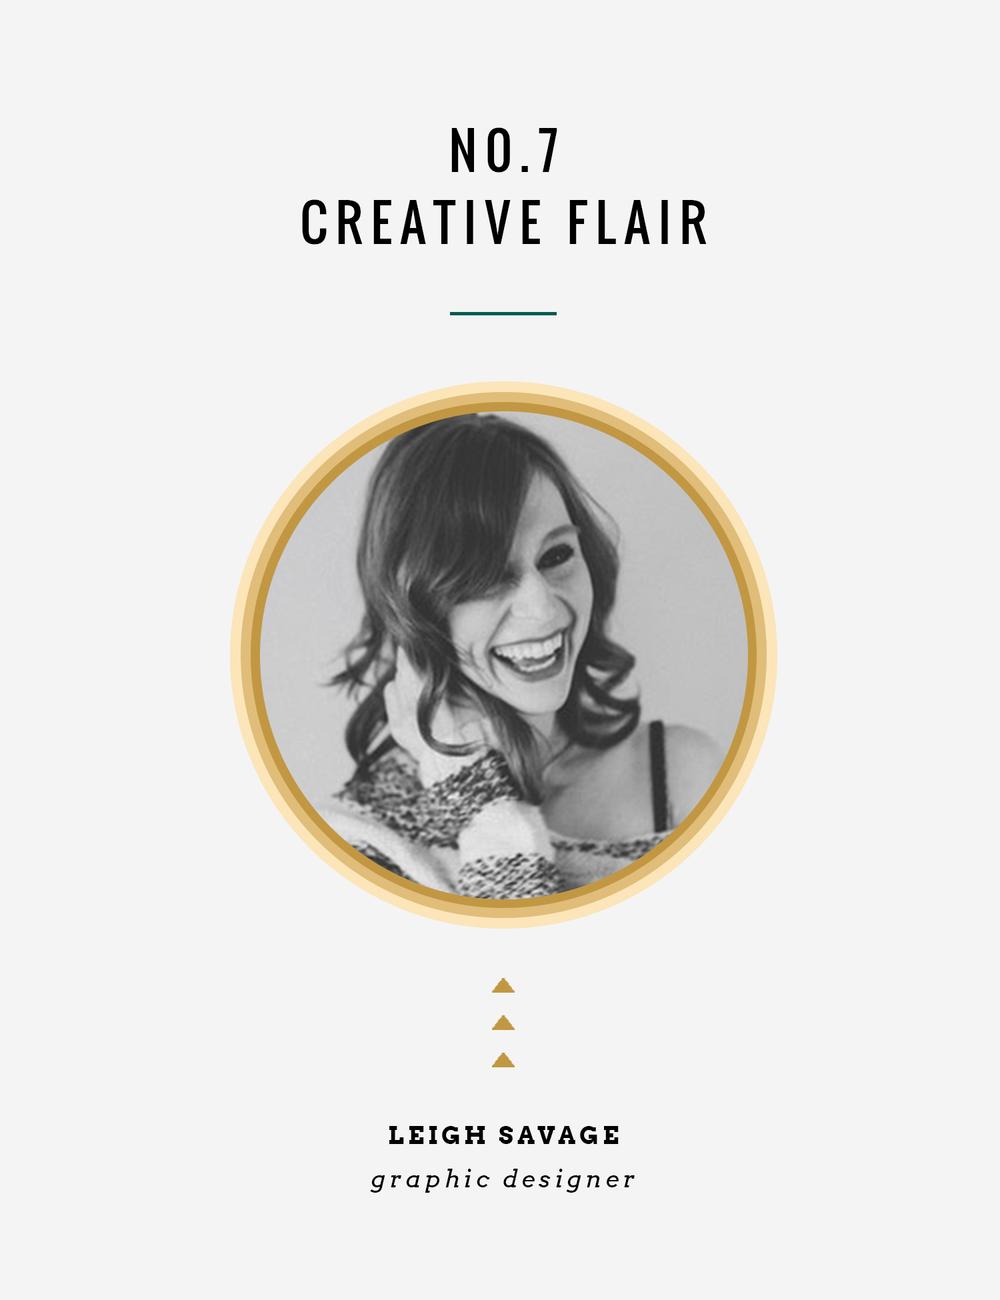 creativeflair_leighsavage